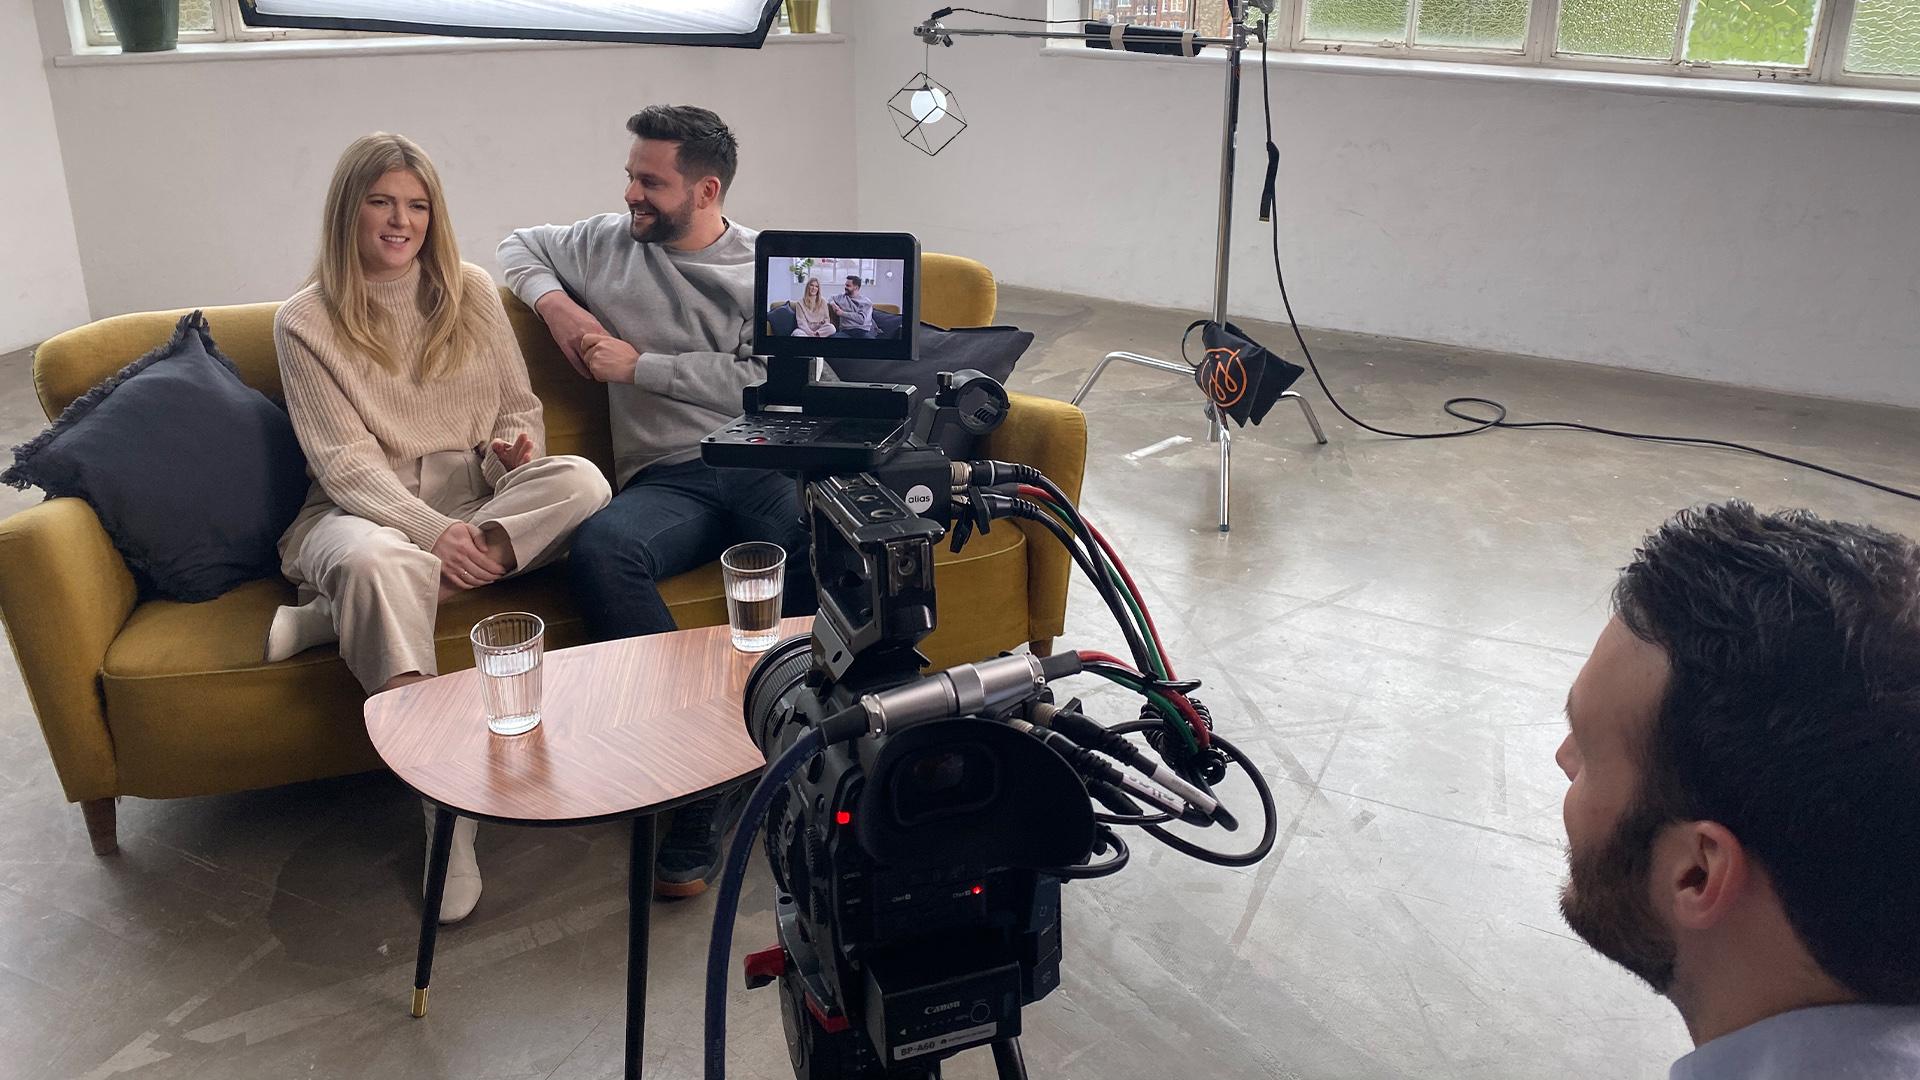 Production Company Prescription Media Launches Publicly